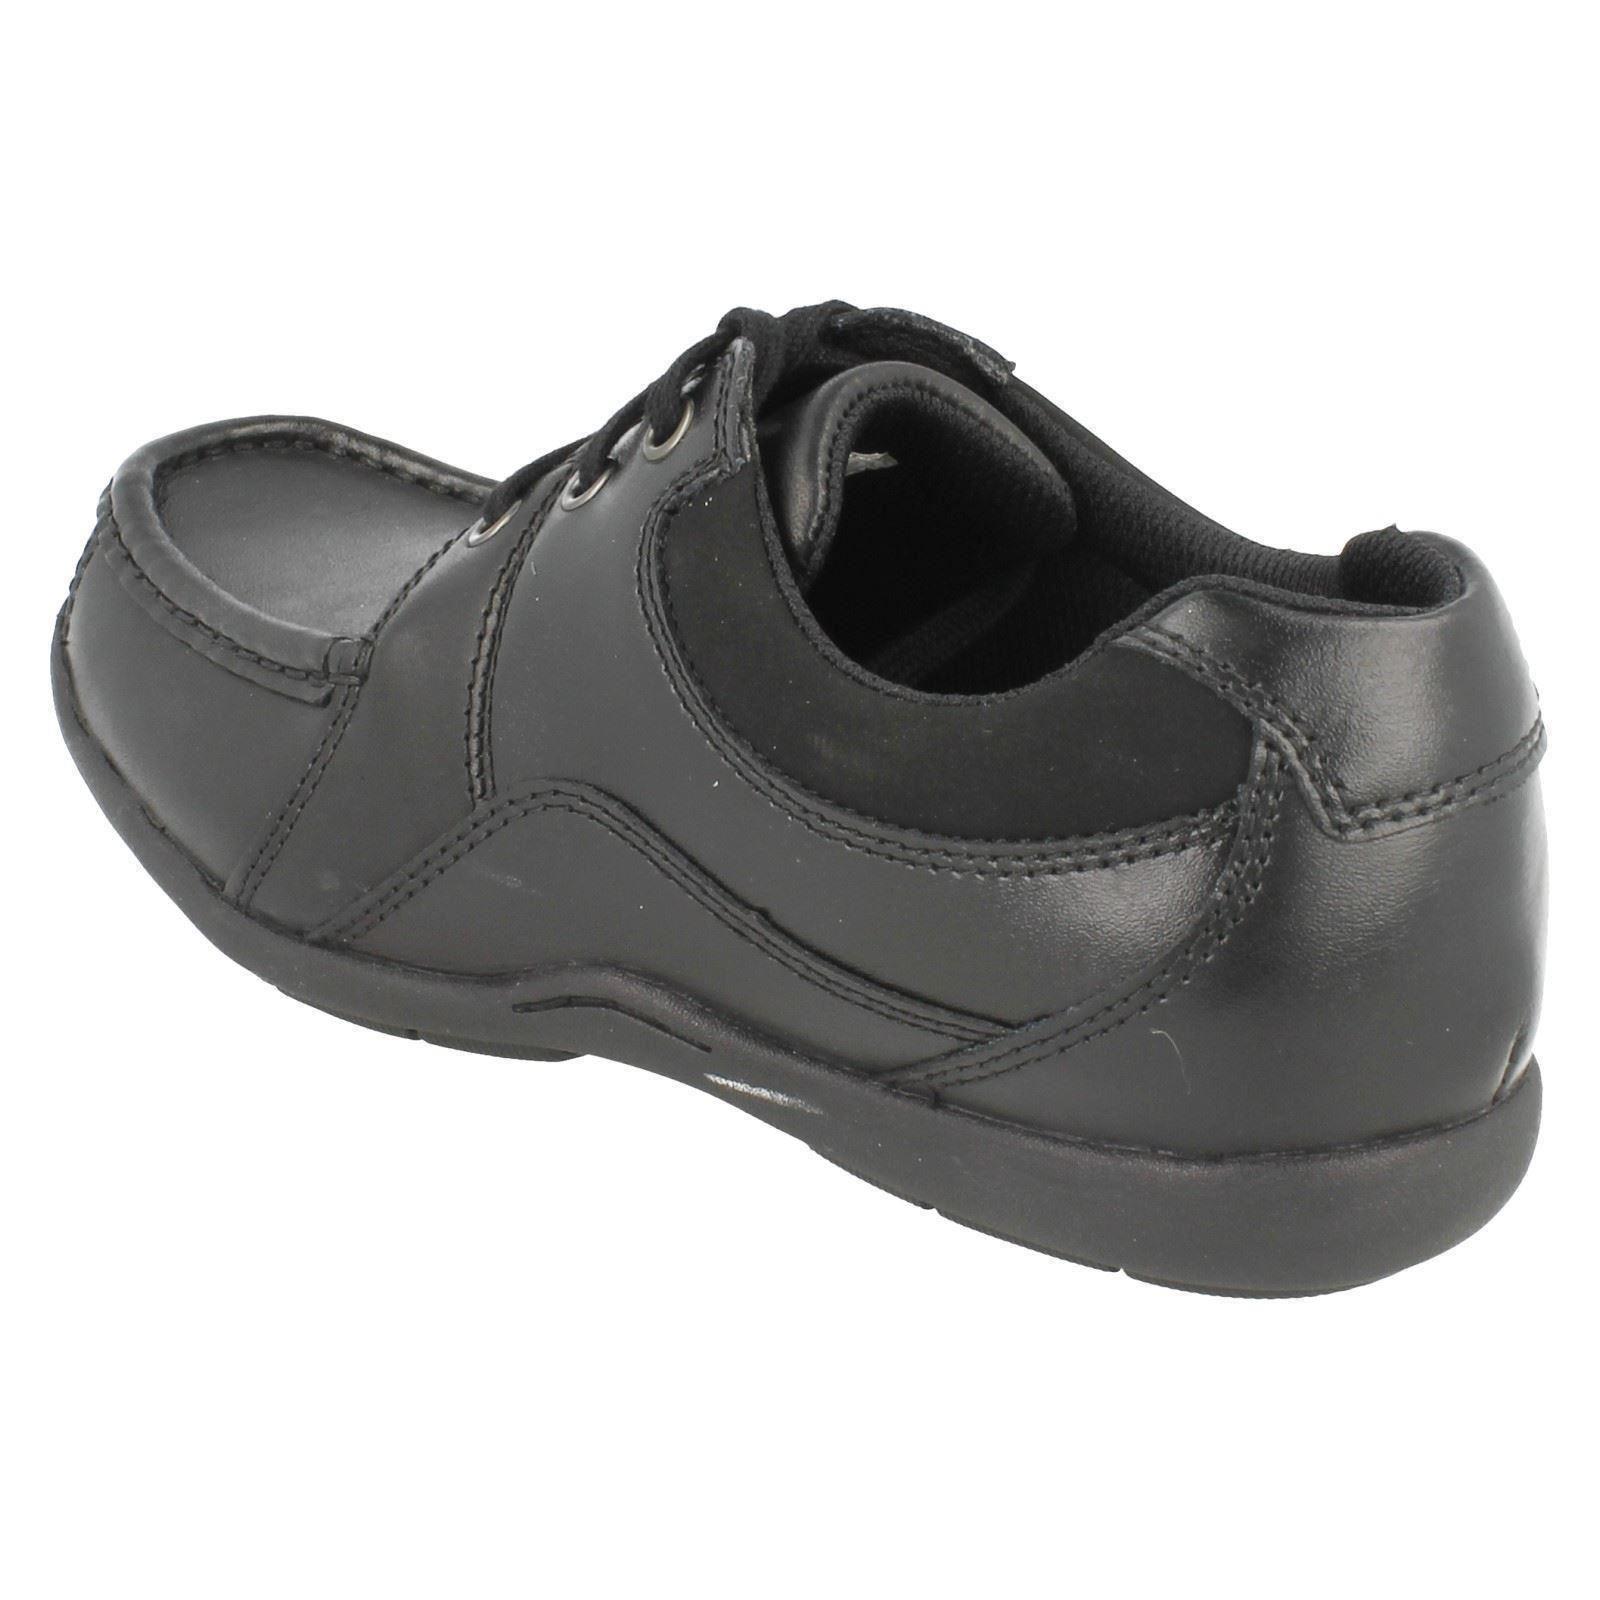 Toe Penwith Shoes niños de Squared Clarks School Black Pañuelo de pXa8Zw1Z